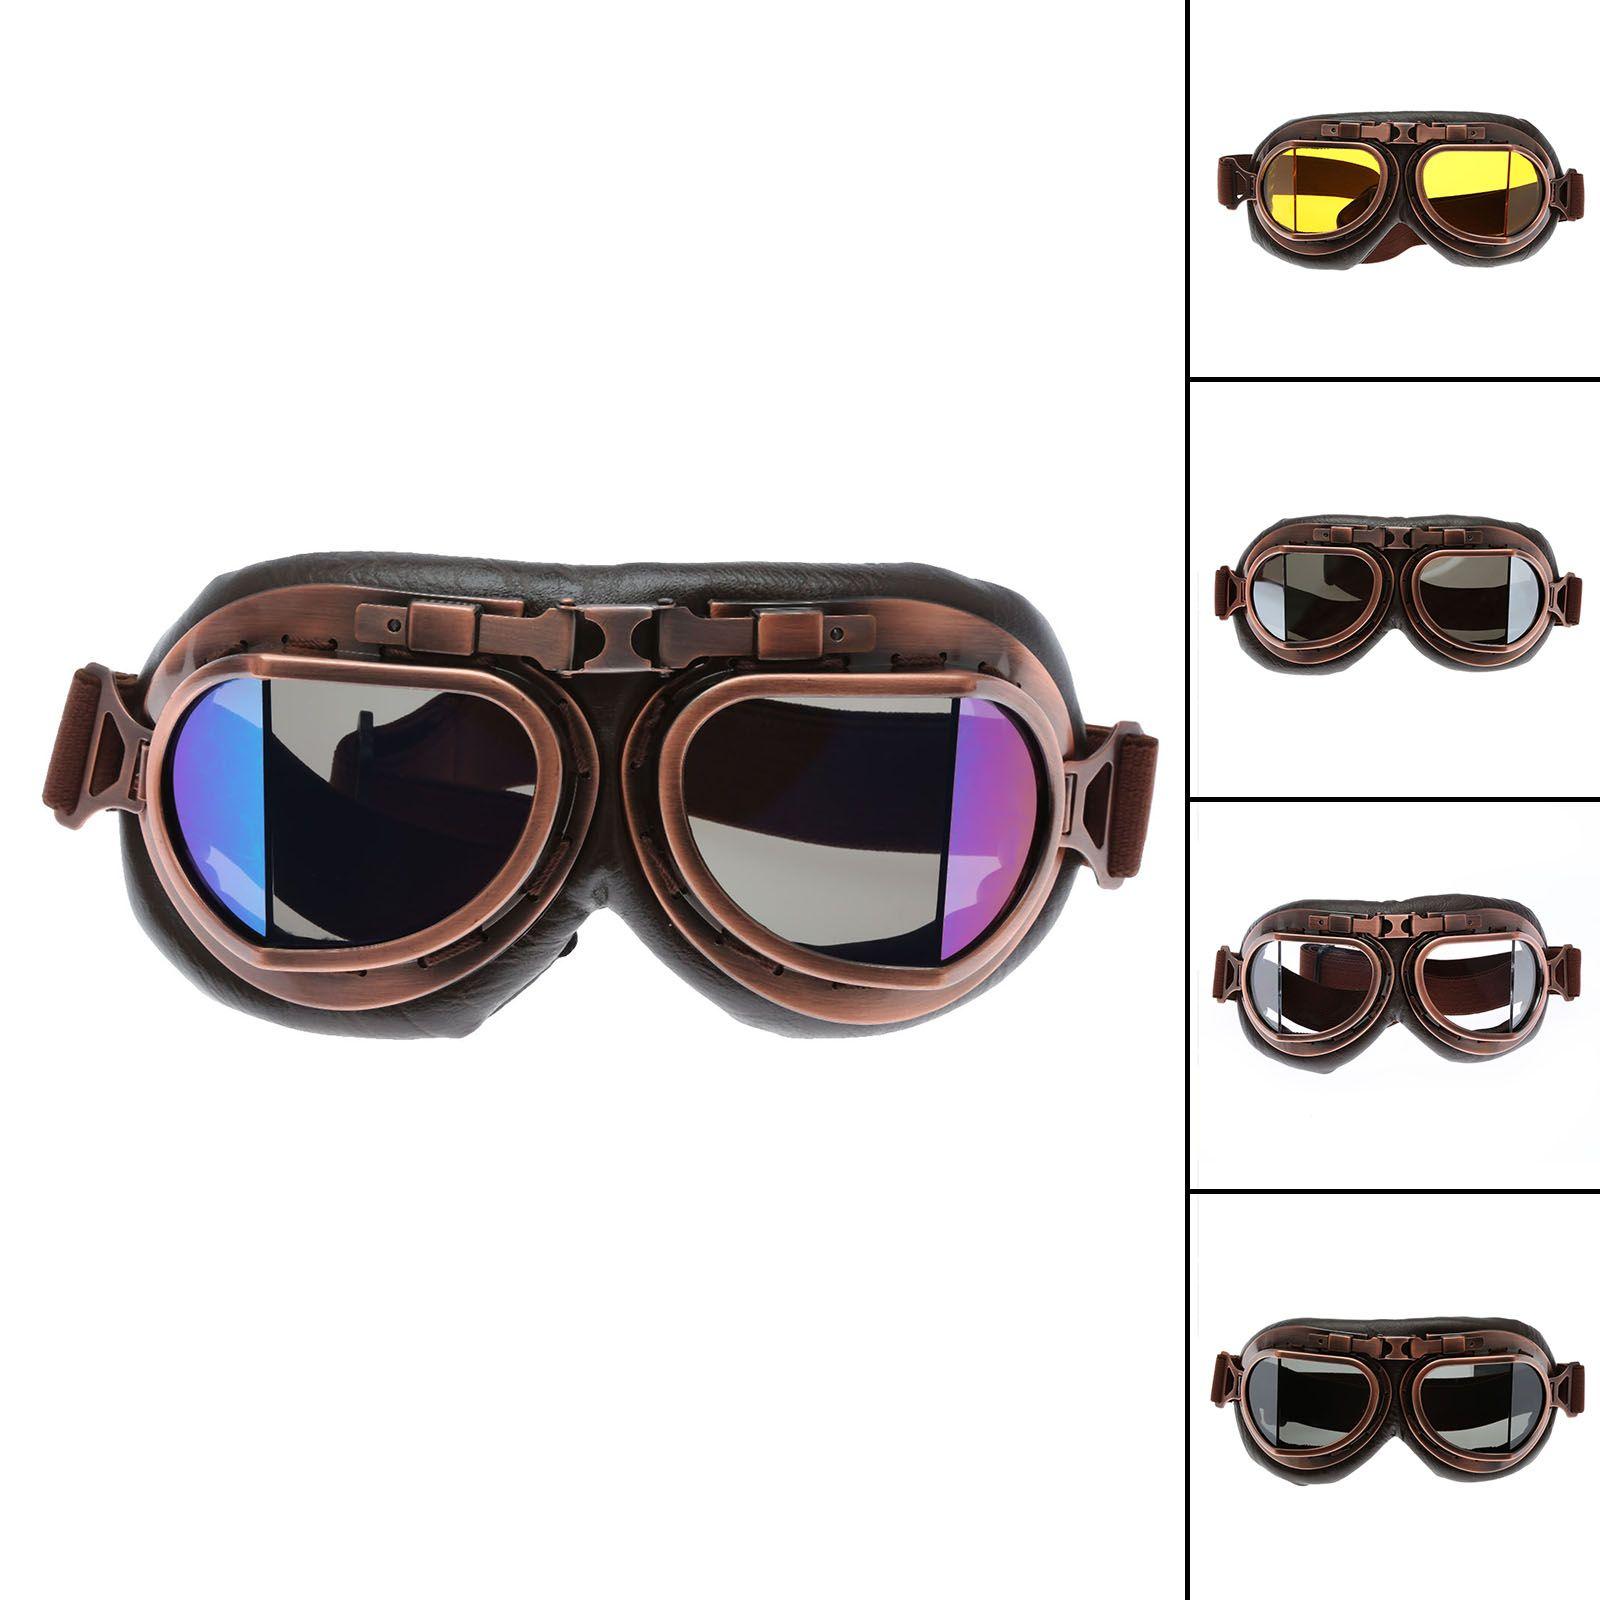 Motorcycle Goggles Glasses Vintage <font><b>Motocross</b></font> Classic Goggles Retro Aviator Pilot Cruiser Steampunk ATV Bike UV Protection Copper